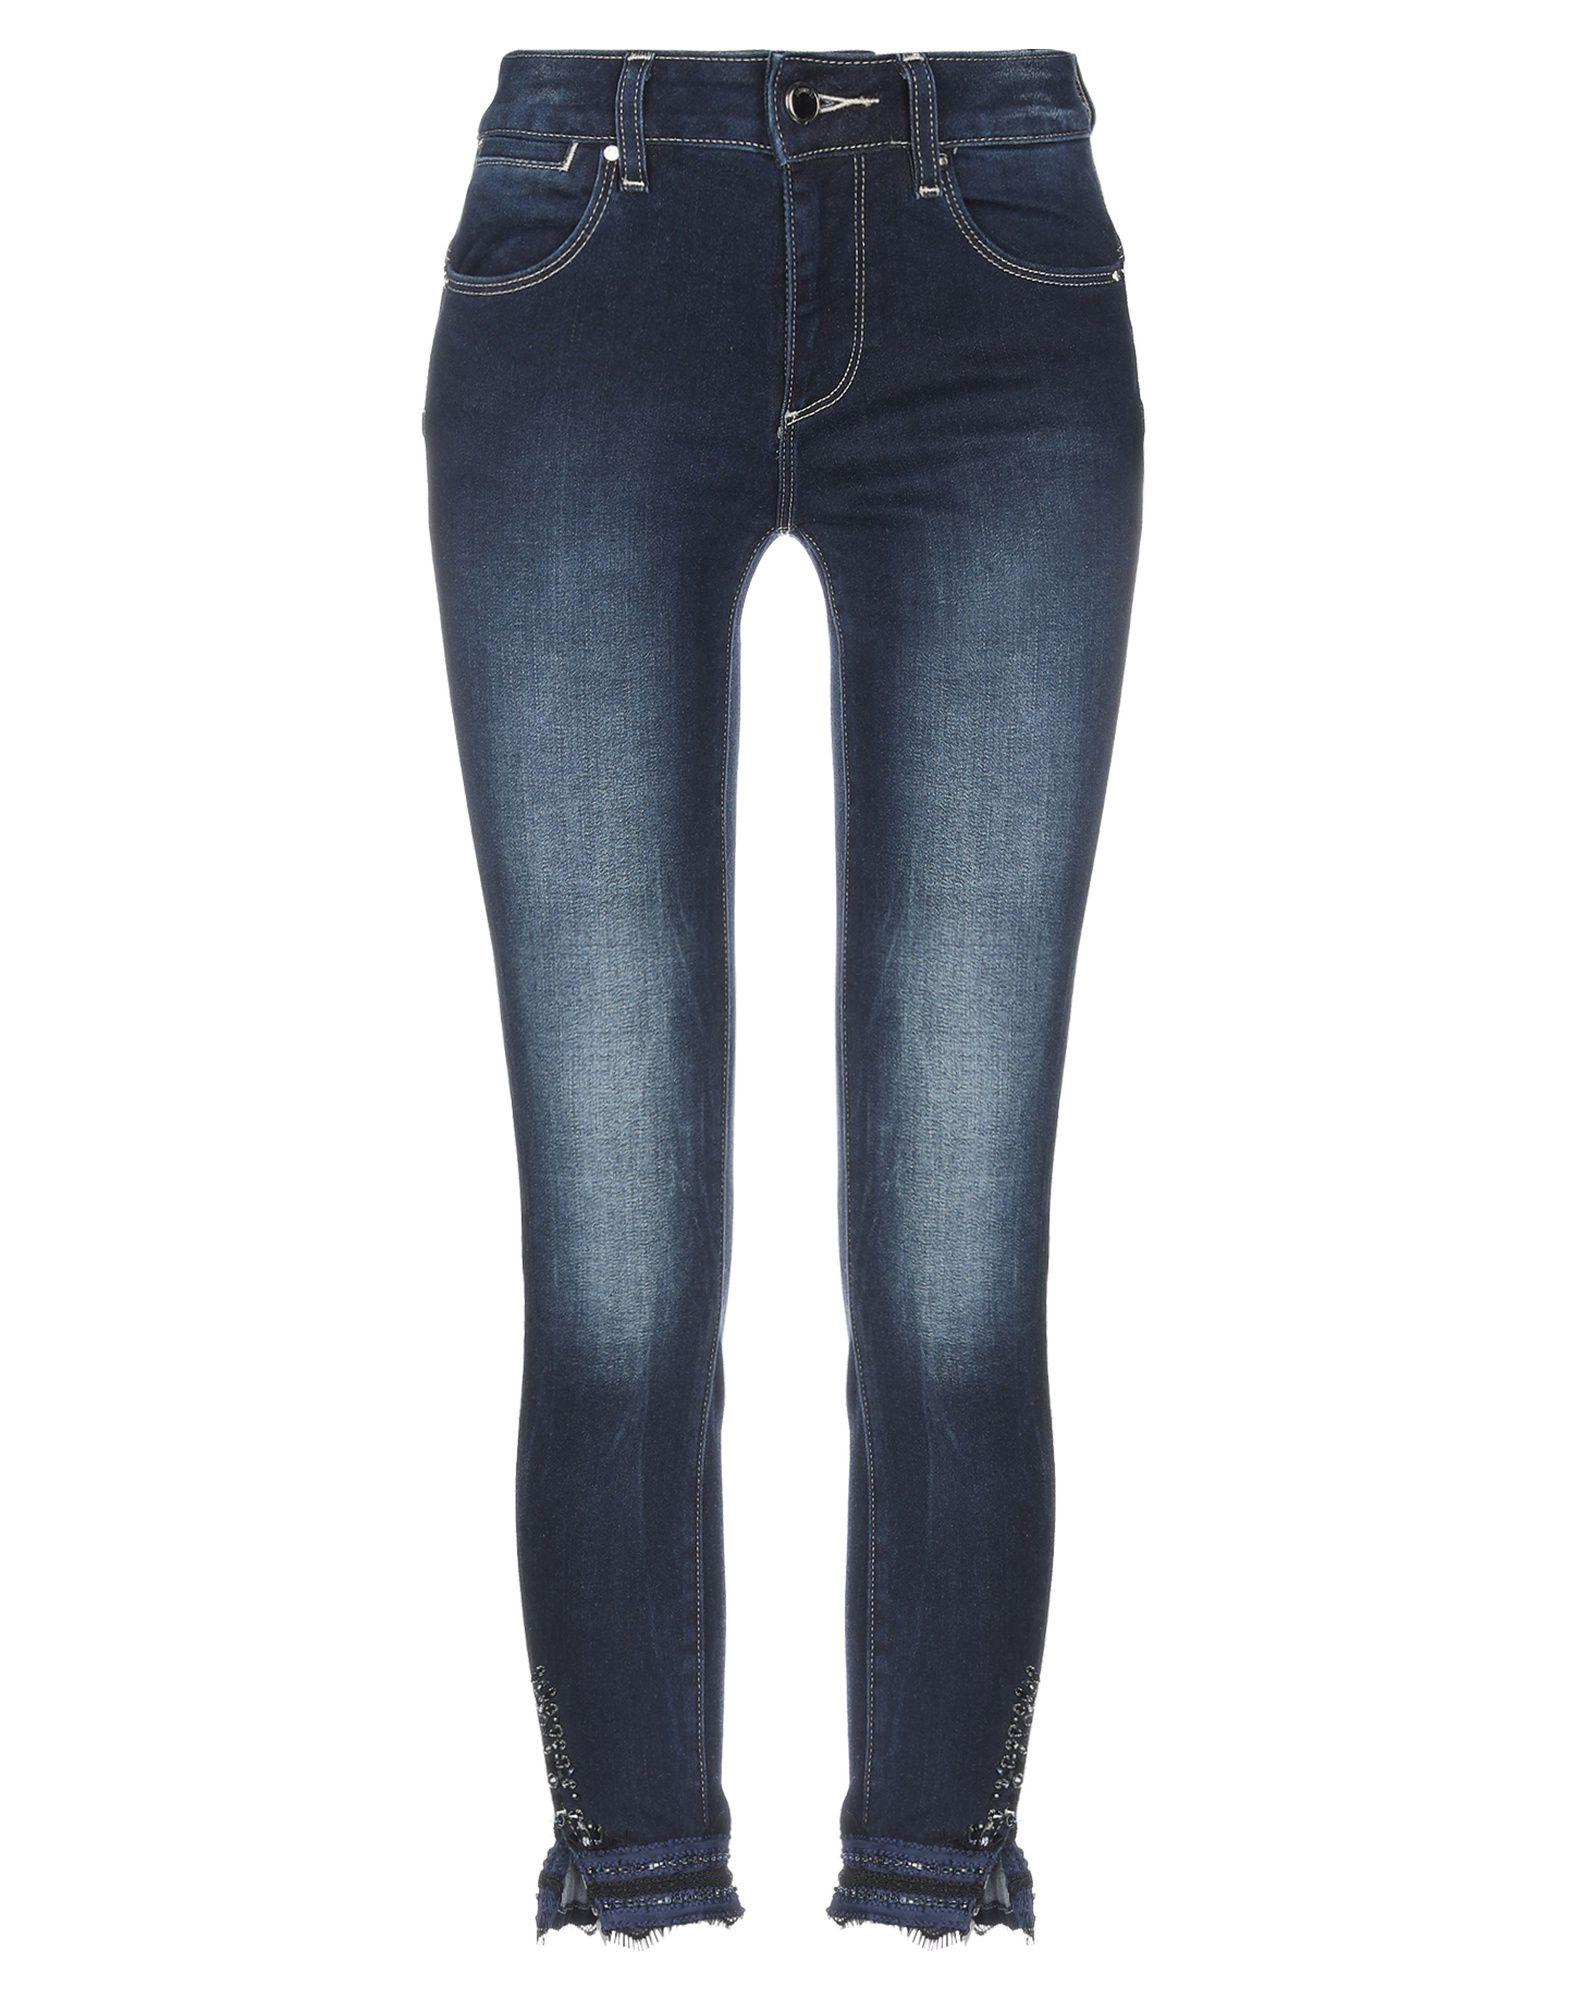 Pantaloni Jeans Fracomina Fracomina donna - 42742055JU  Wir liefern das Beste